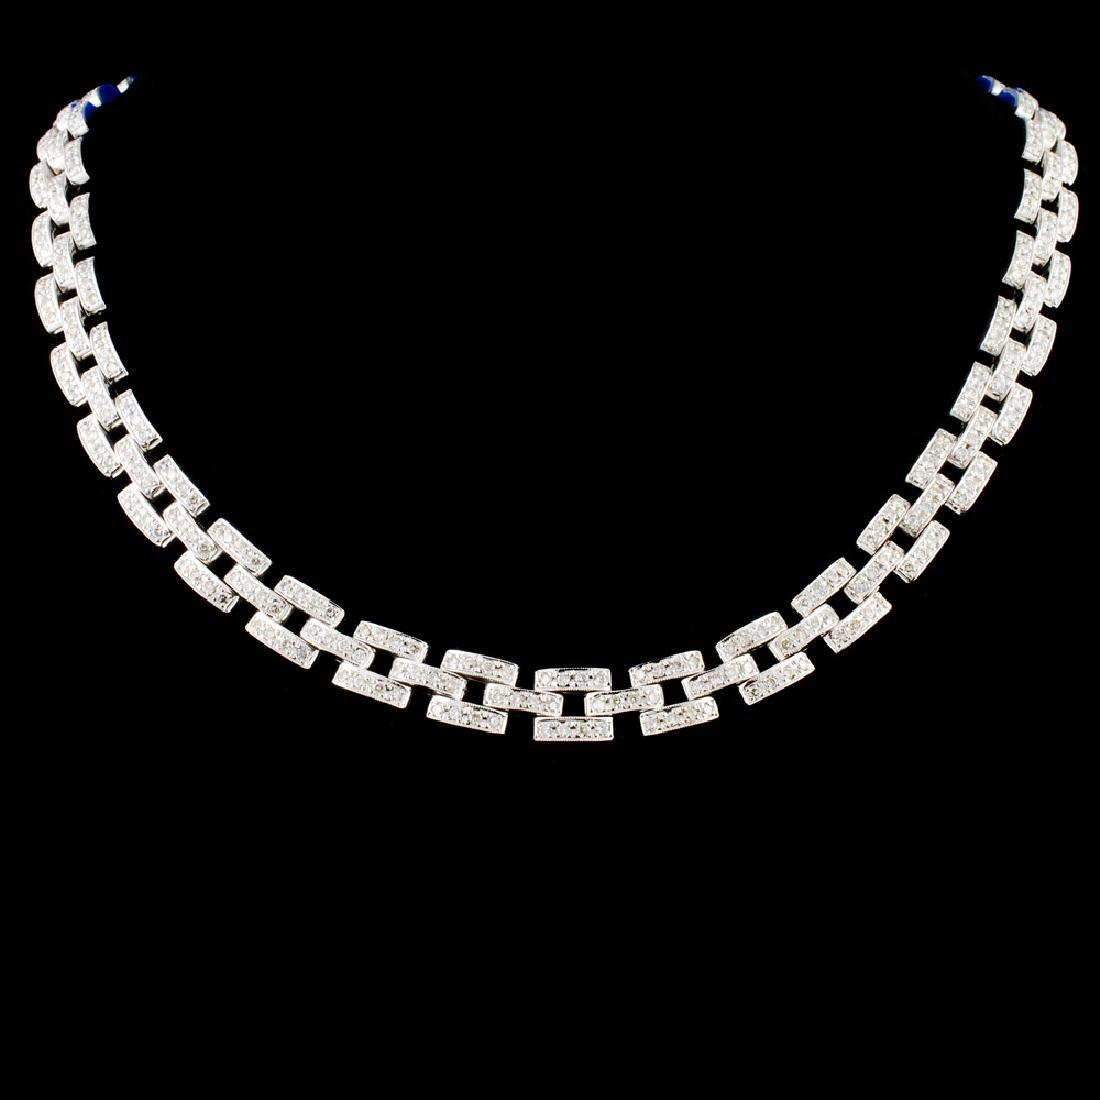 14K Gold 4.81ctw Diamond Necklace